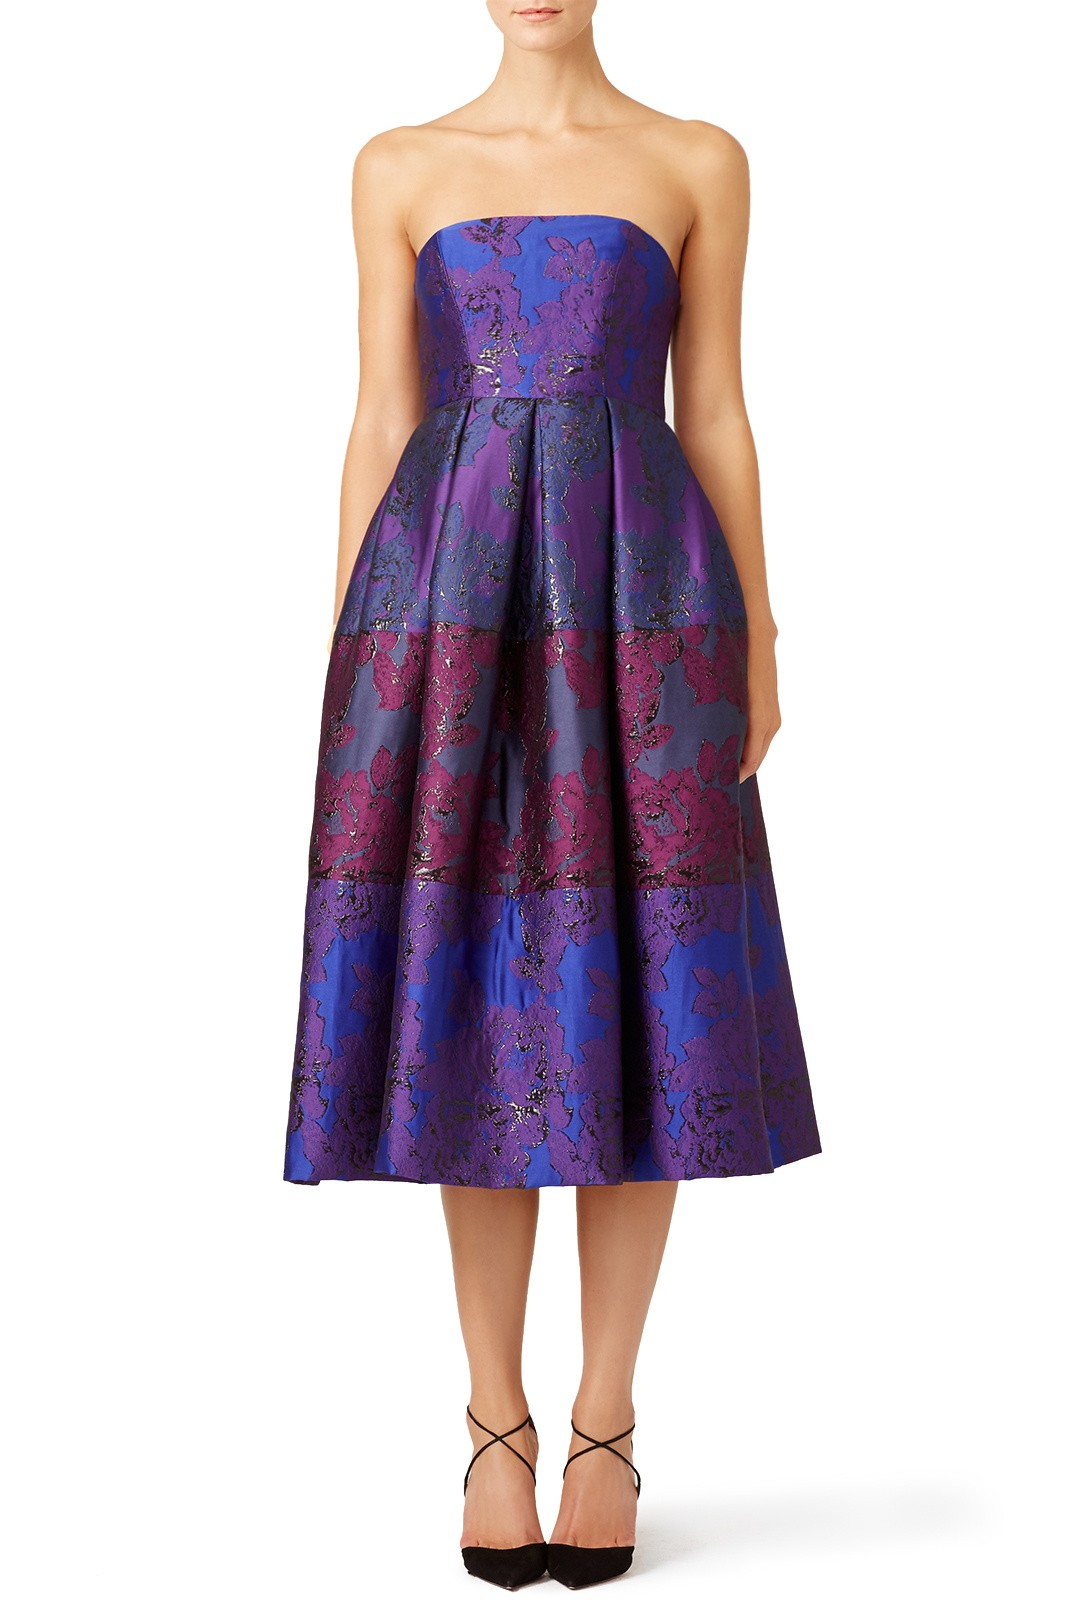 Purple dresses purple dresses for weddings more pretty purple wedding guest dresses ombrellifo Image collections